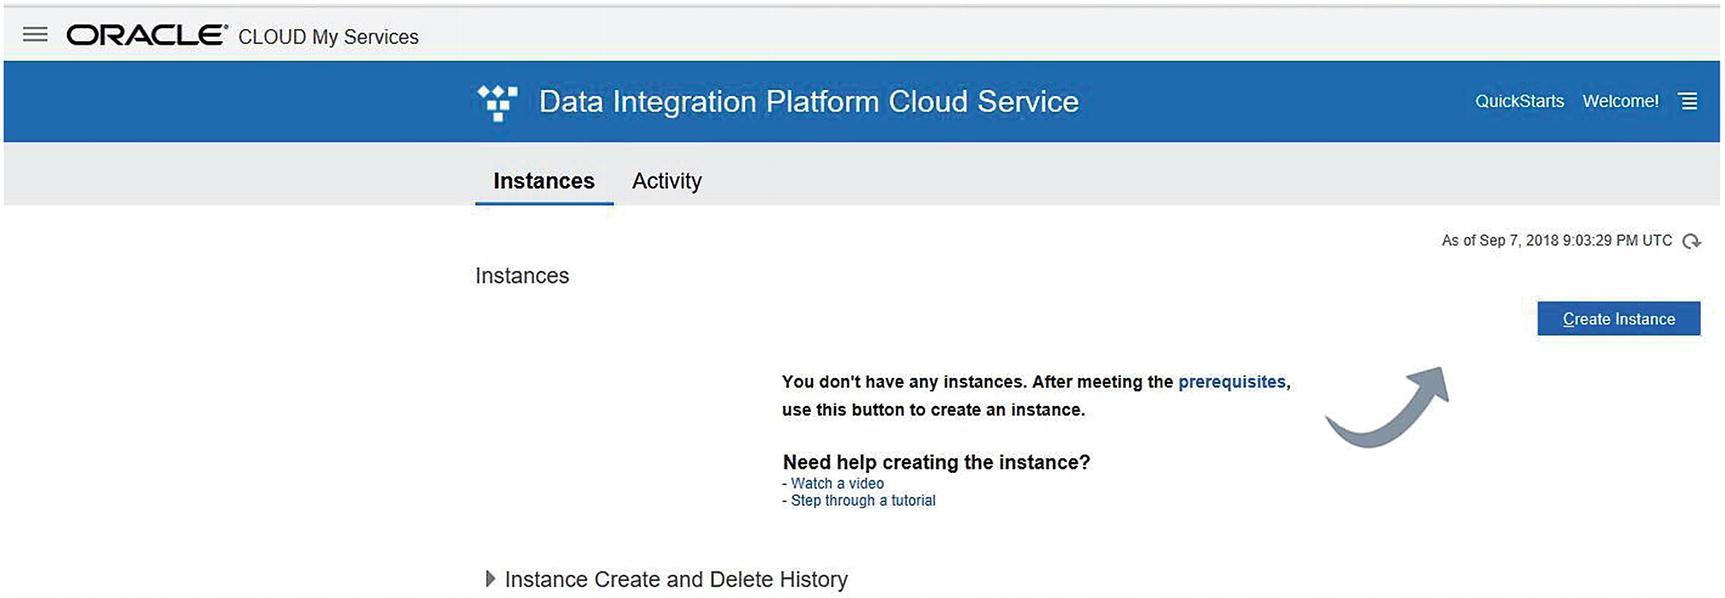 Migrating Databases to Exadata Cloud Service Using DIPC